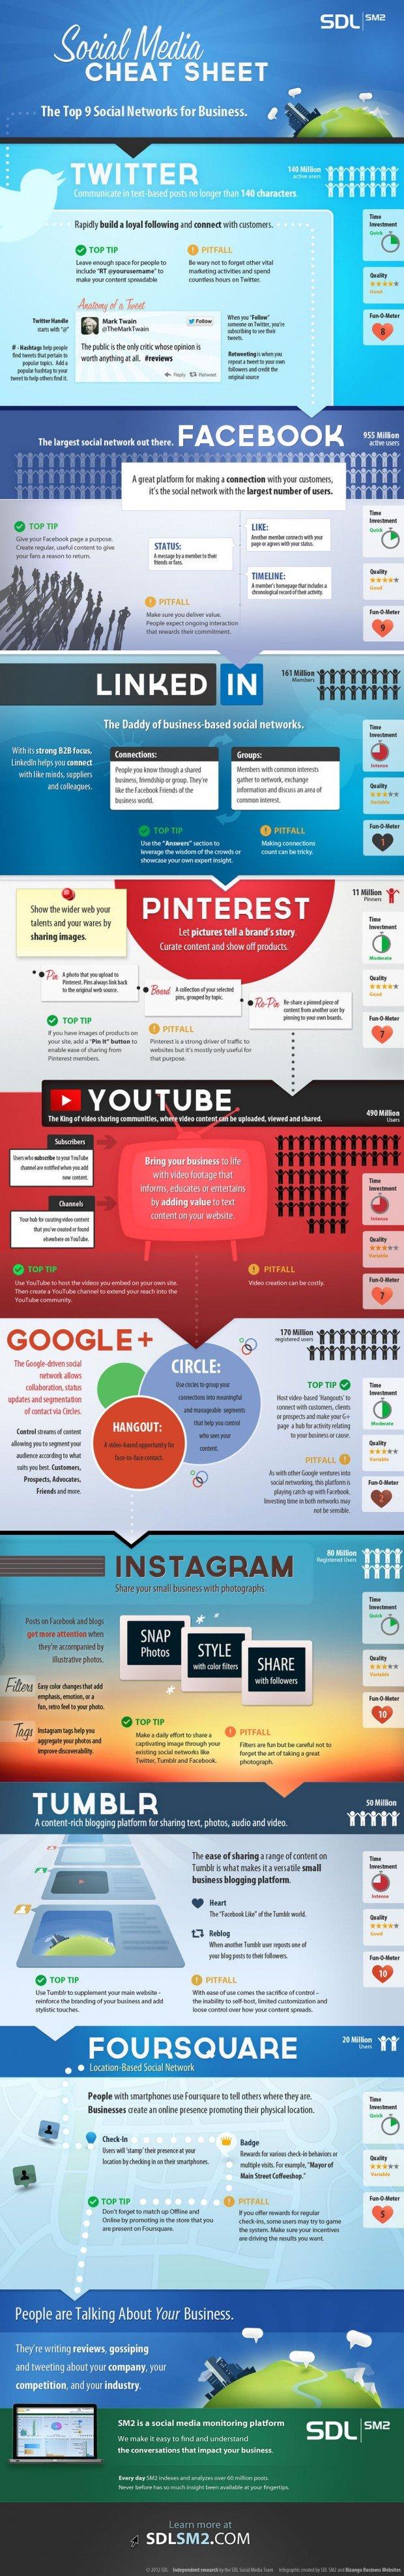 Social Media Cheat Sheet [Infographic]